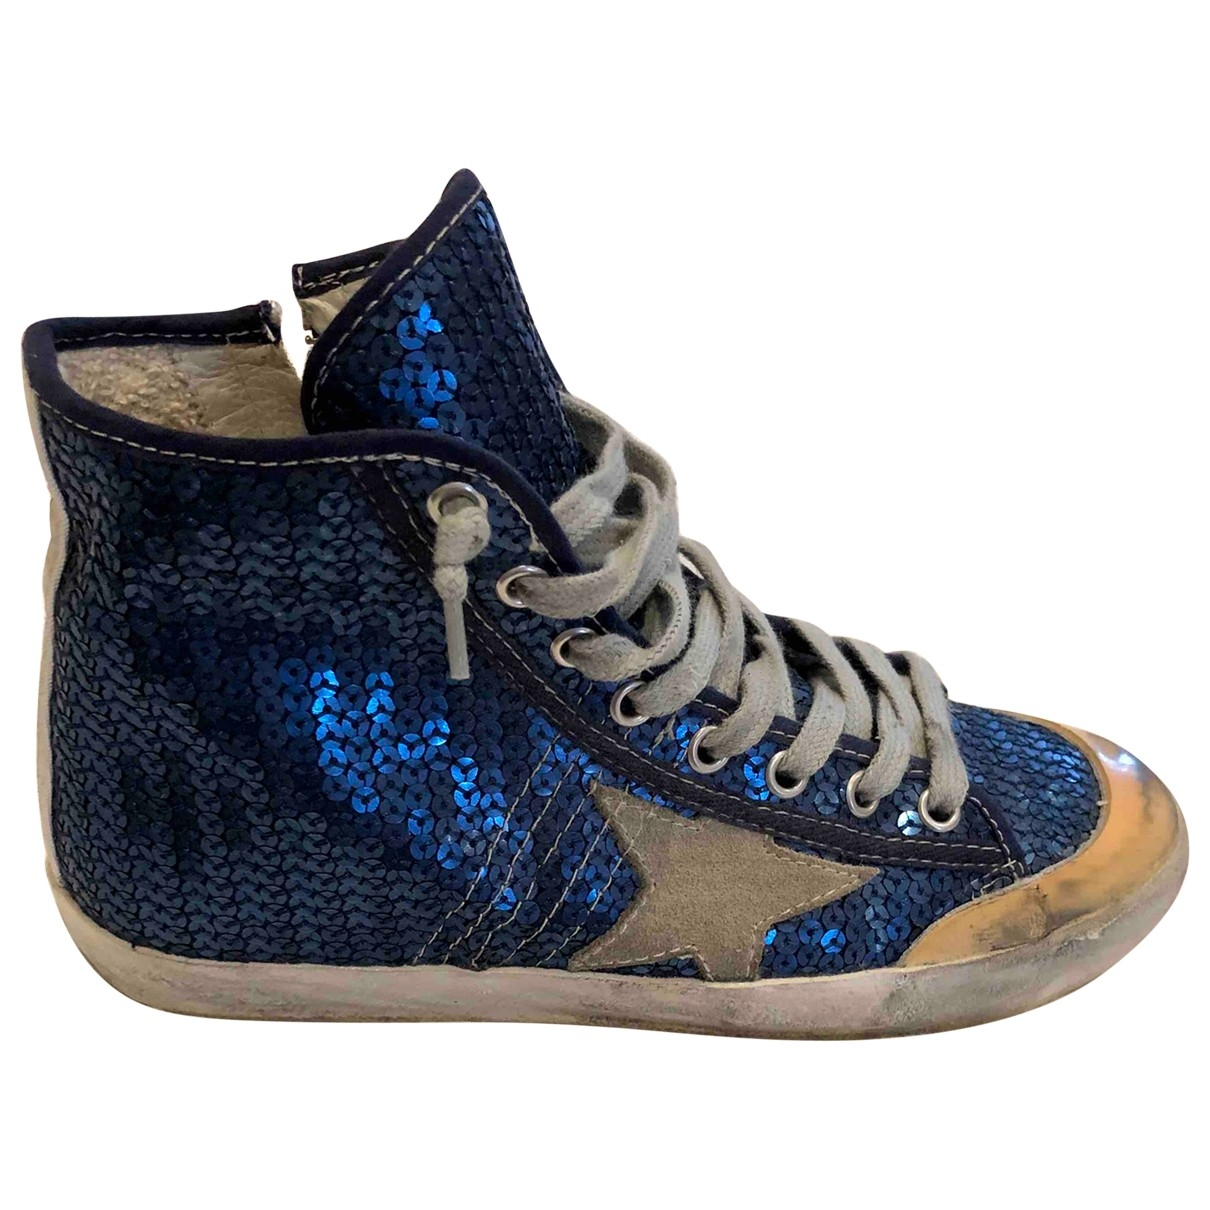 Golden Goose - Baskets Francy pour femme en cuir - bleu